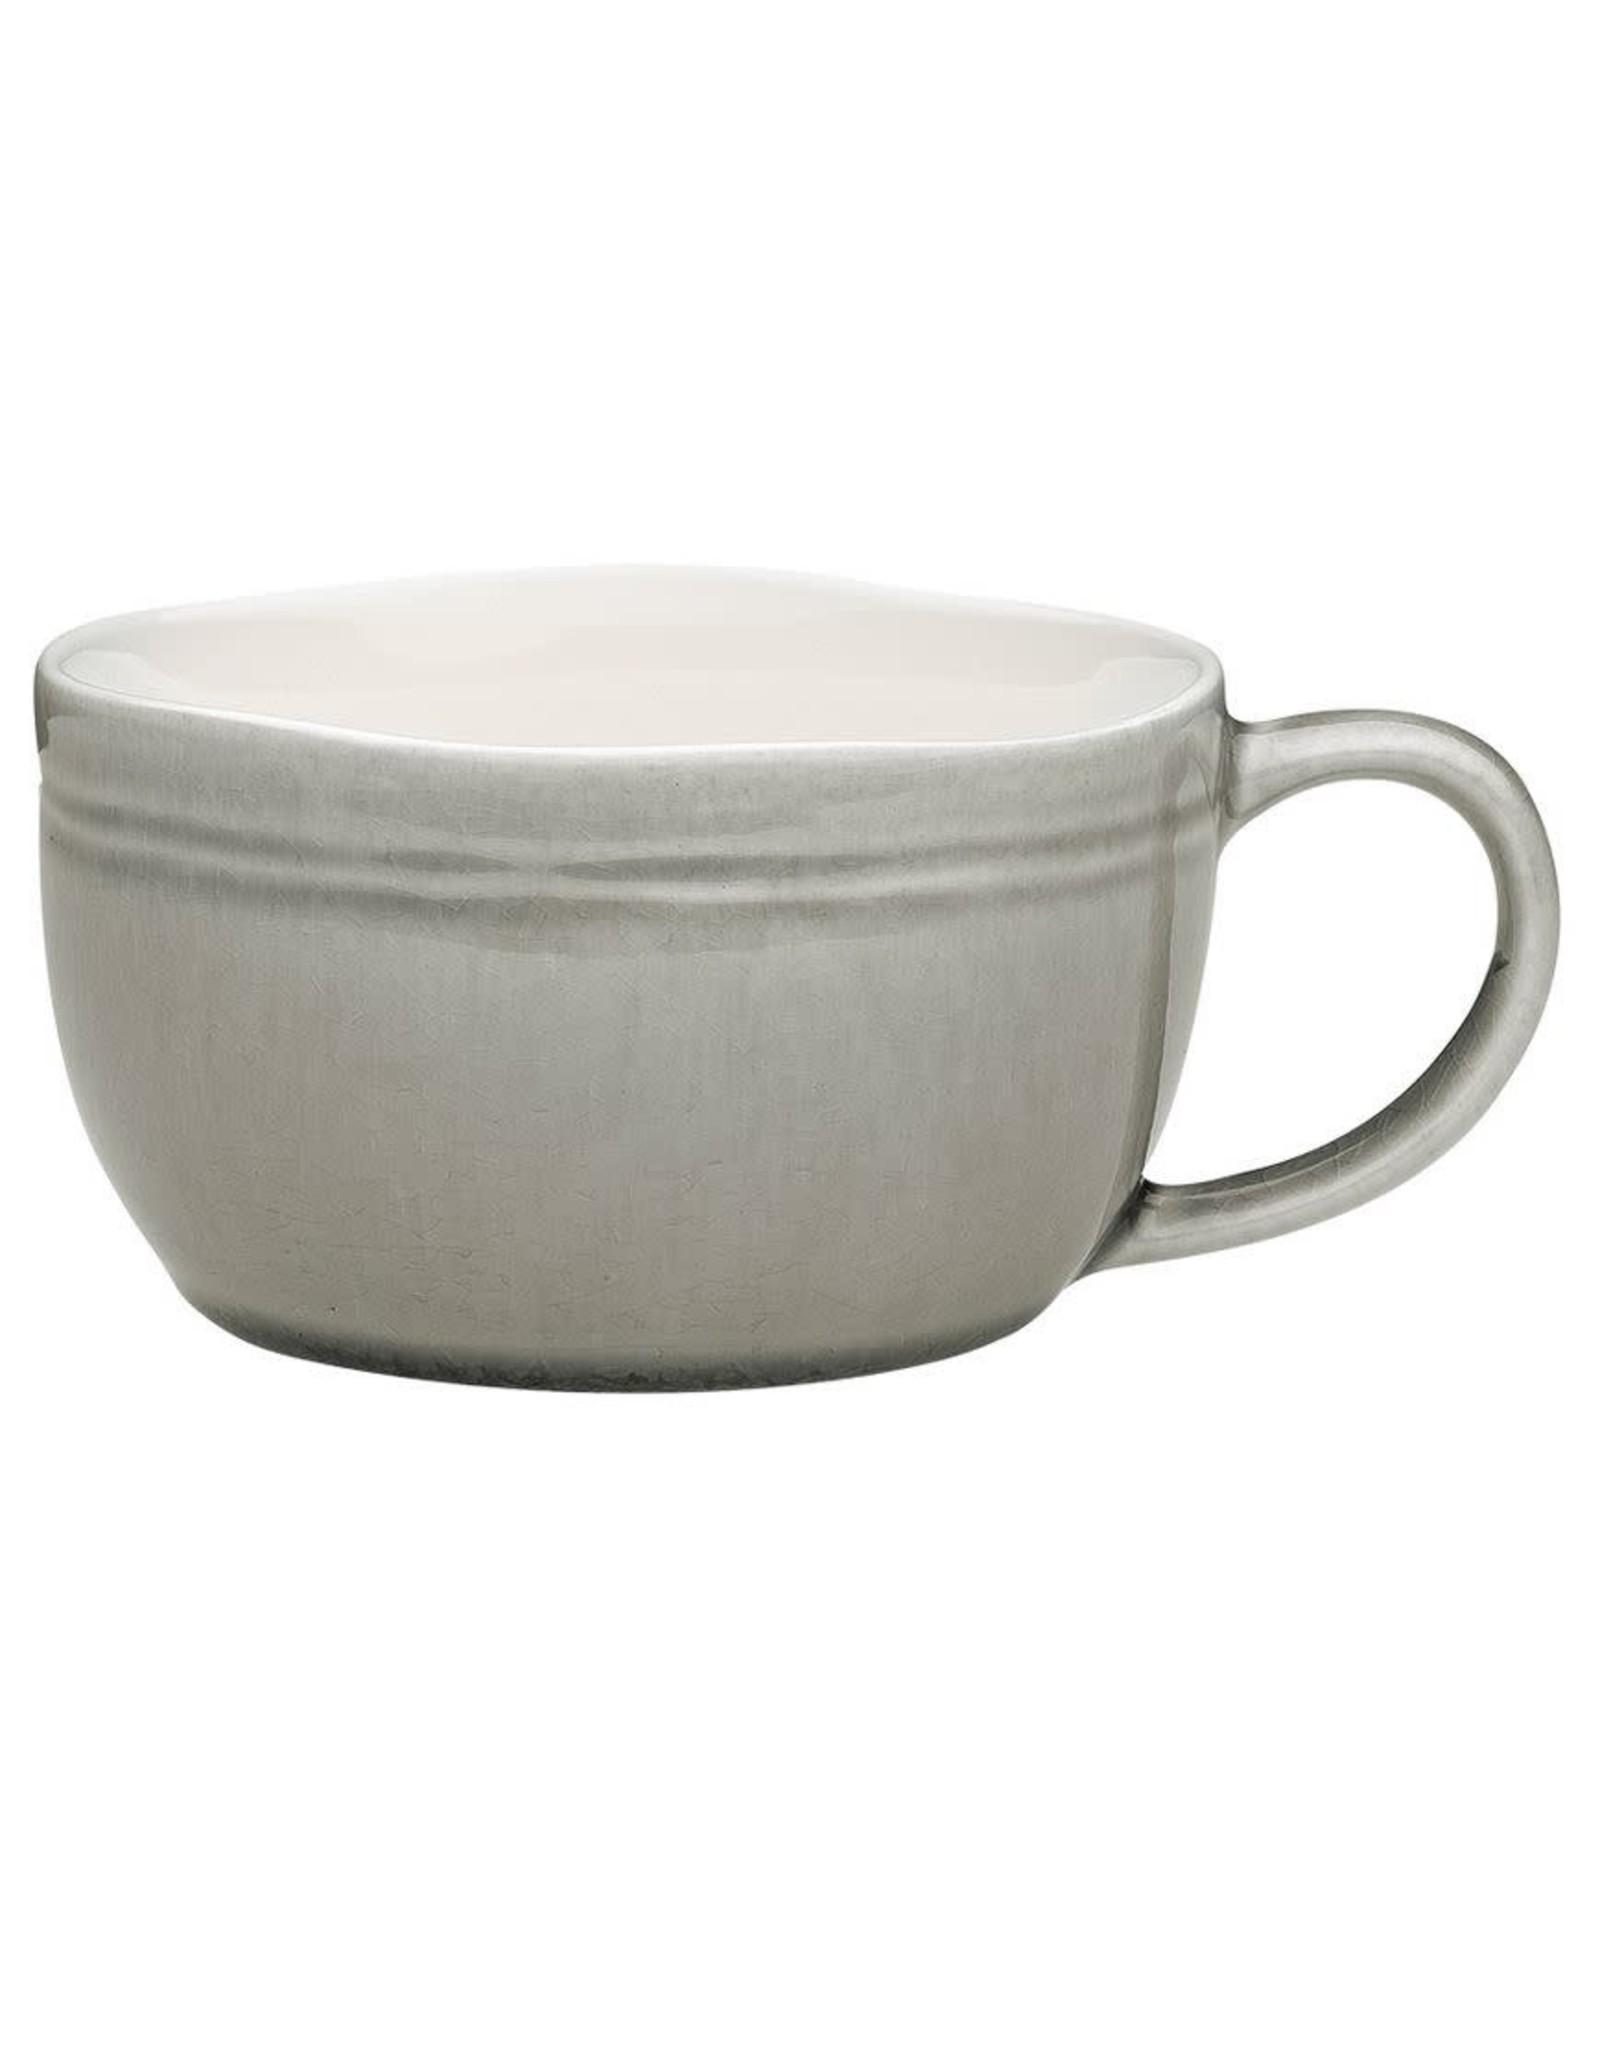 Ecology Ecology Linea Mineral Crackle Soup Mug